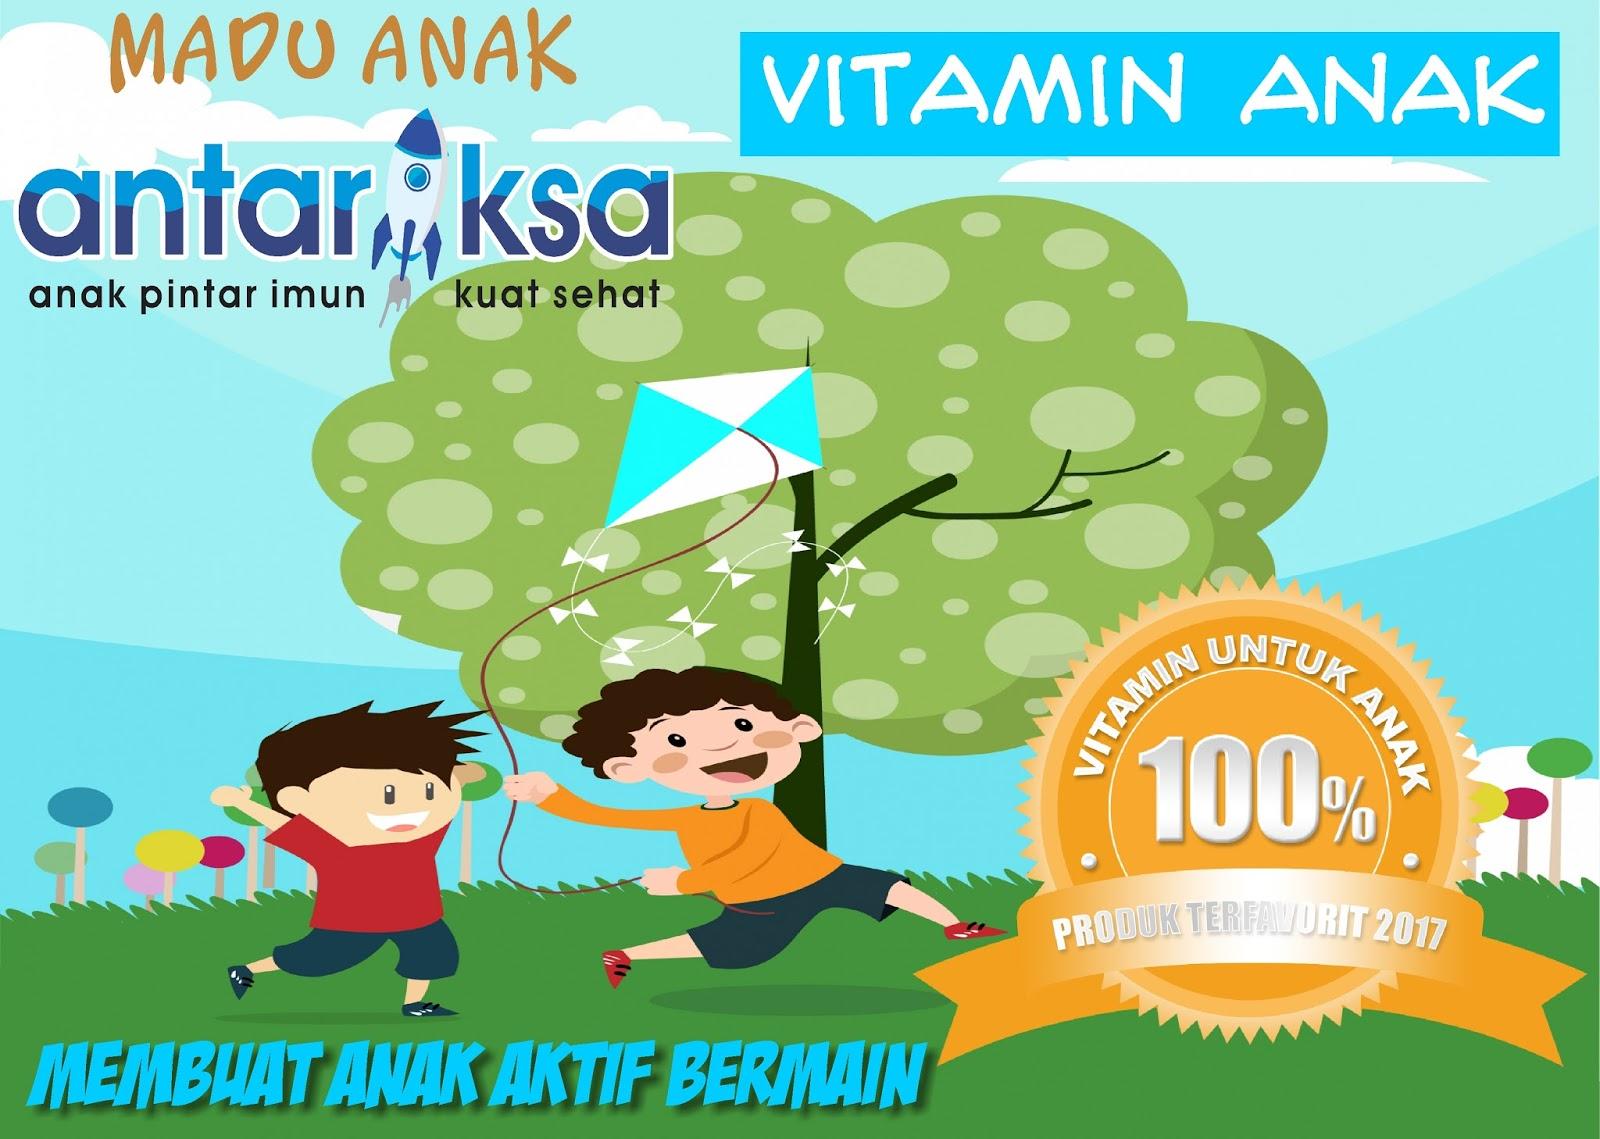 Vitamin Anak Supaya Aktif Bermain